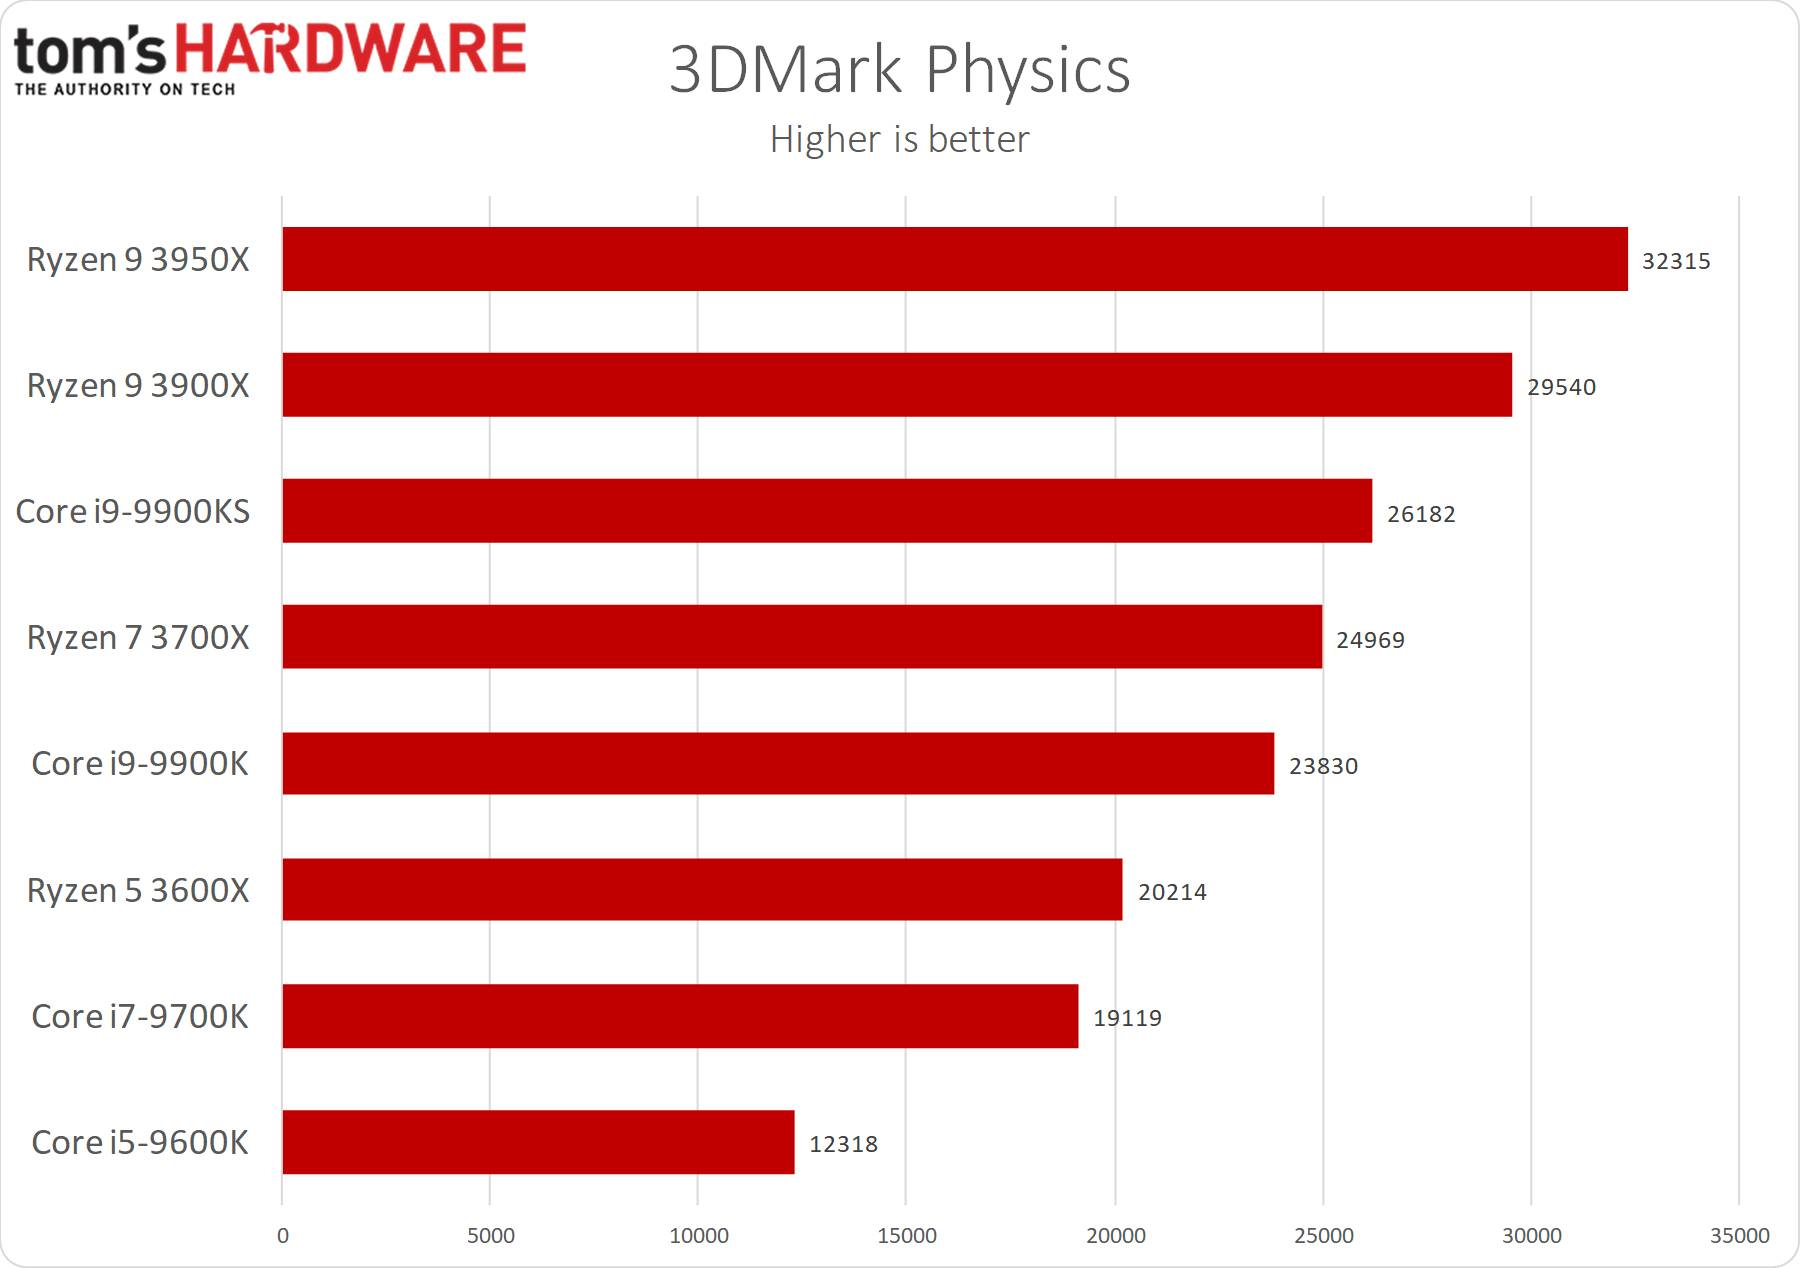 3dMark Physics